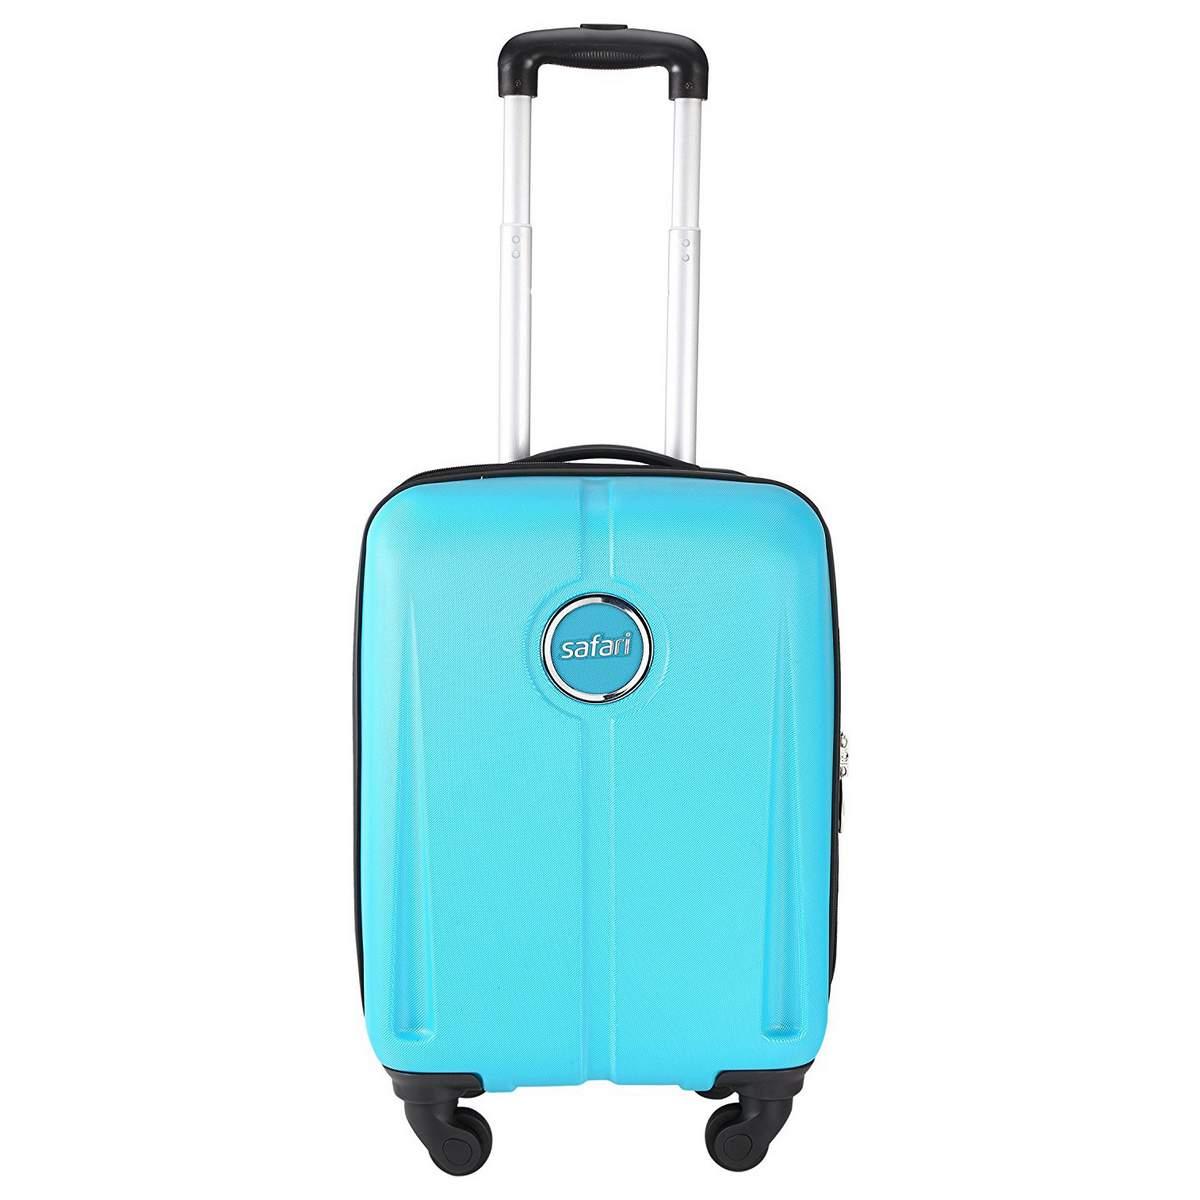 Safari Revolution 63 cm Hard Luggage Bag cf70691af84a6